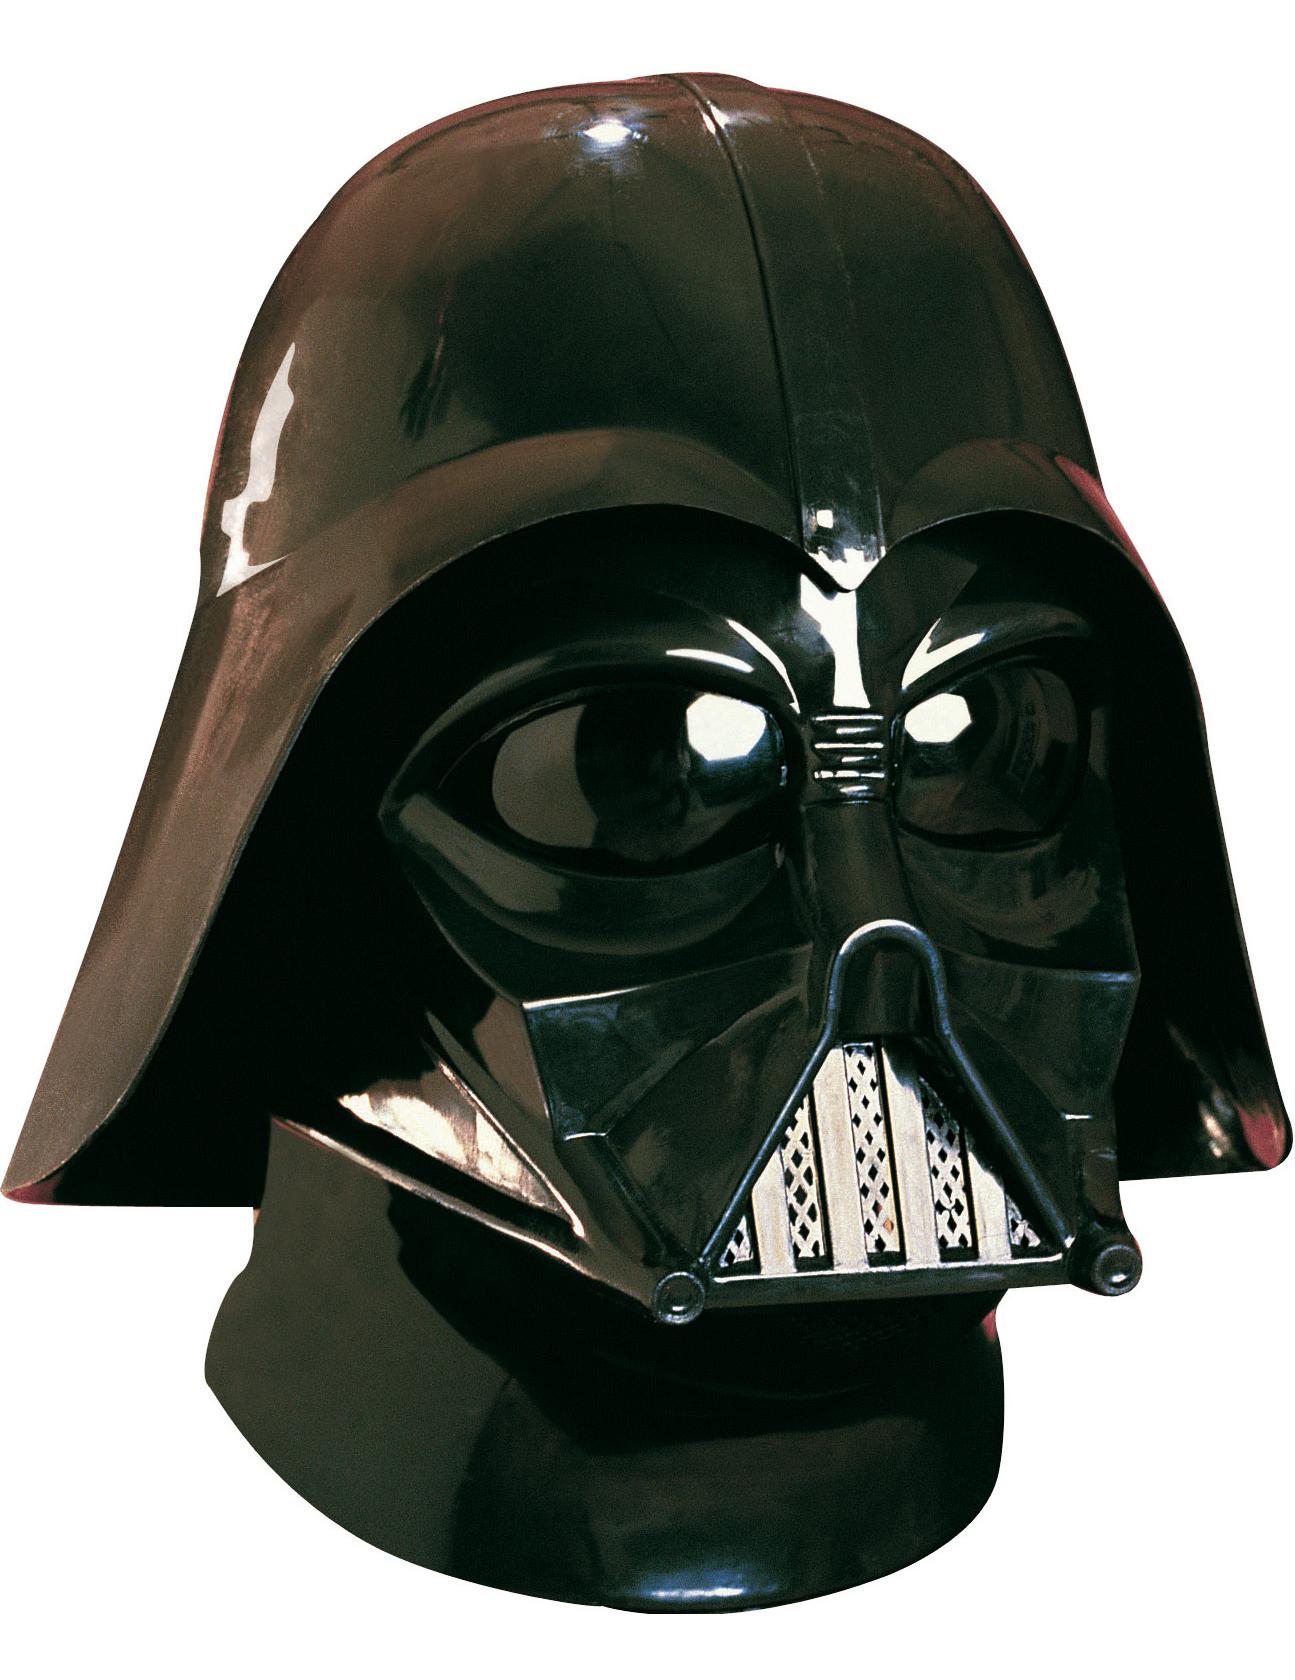 casque int gral 2 pi ces dark vador star wars adulte achat de masques sur vegaoopro. Black Bedroom Furniture Sets. Home Design Ideas